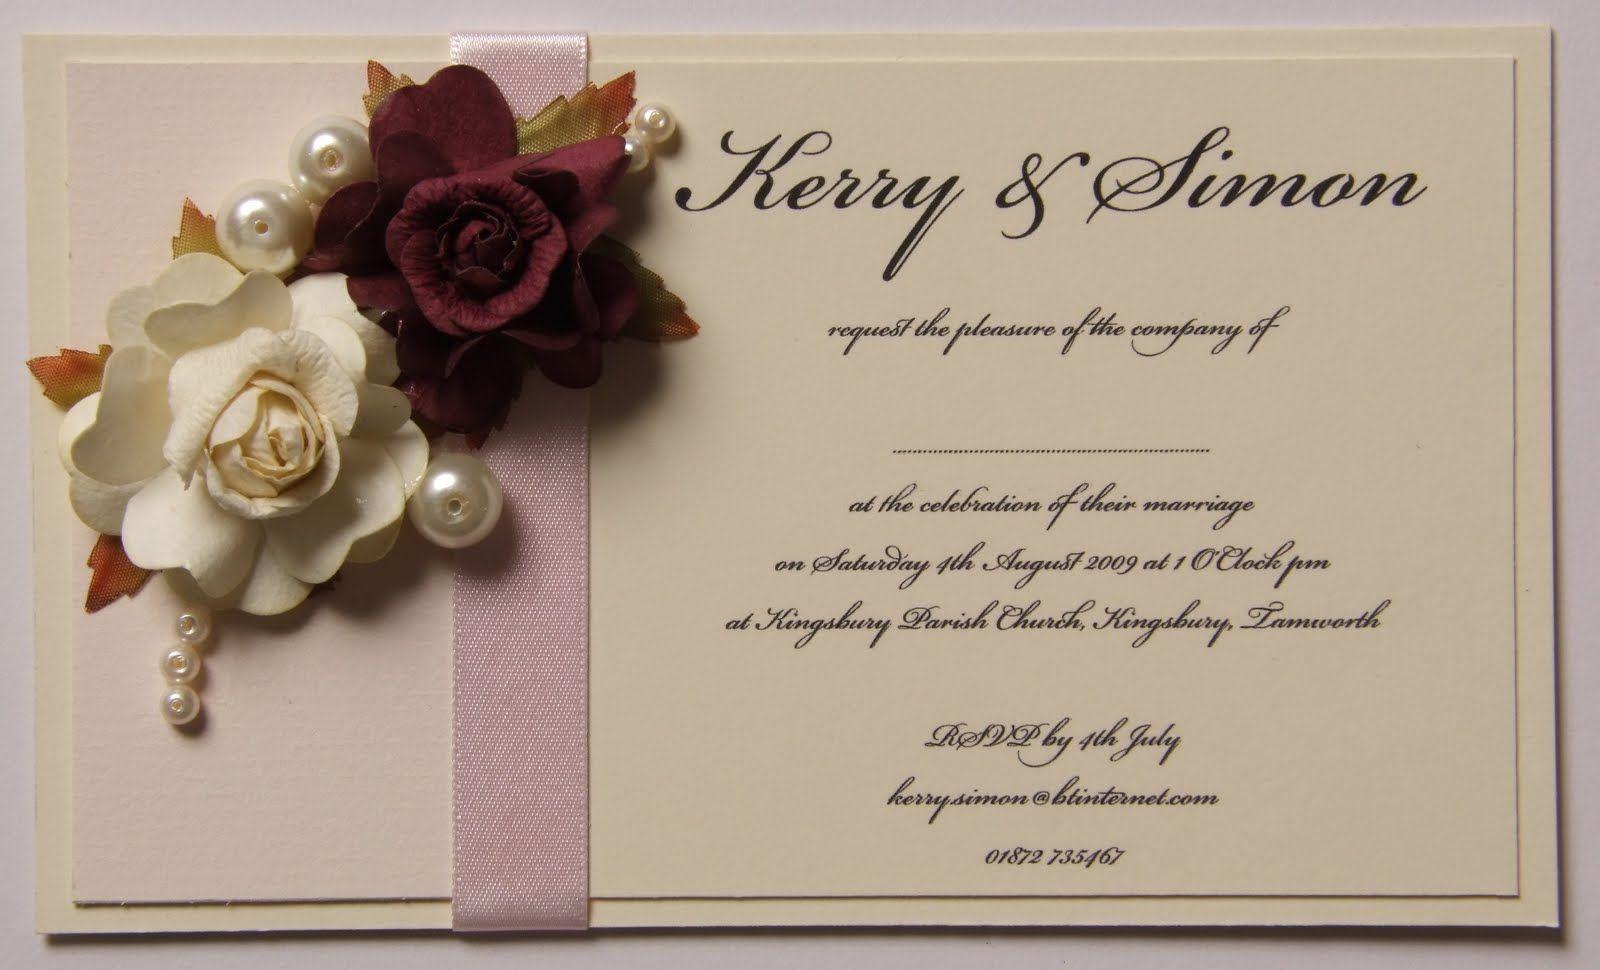 burgandy and gold invitations - Google Search | Wedding ideas ...